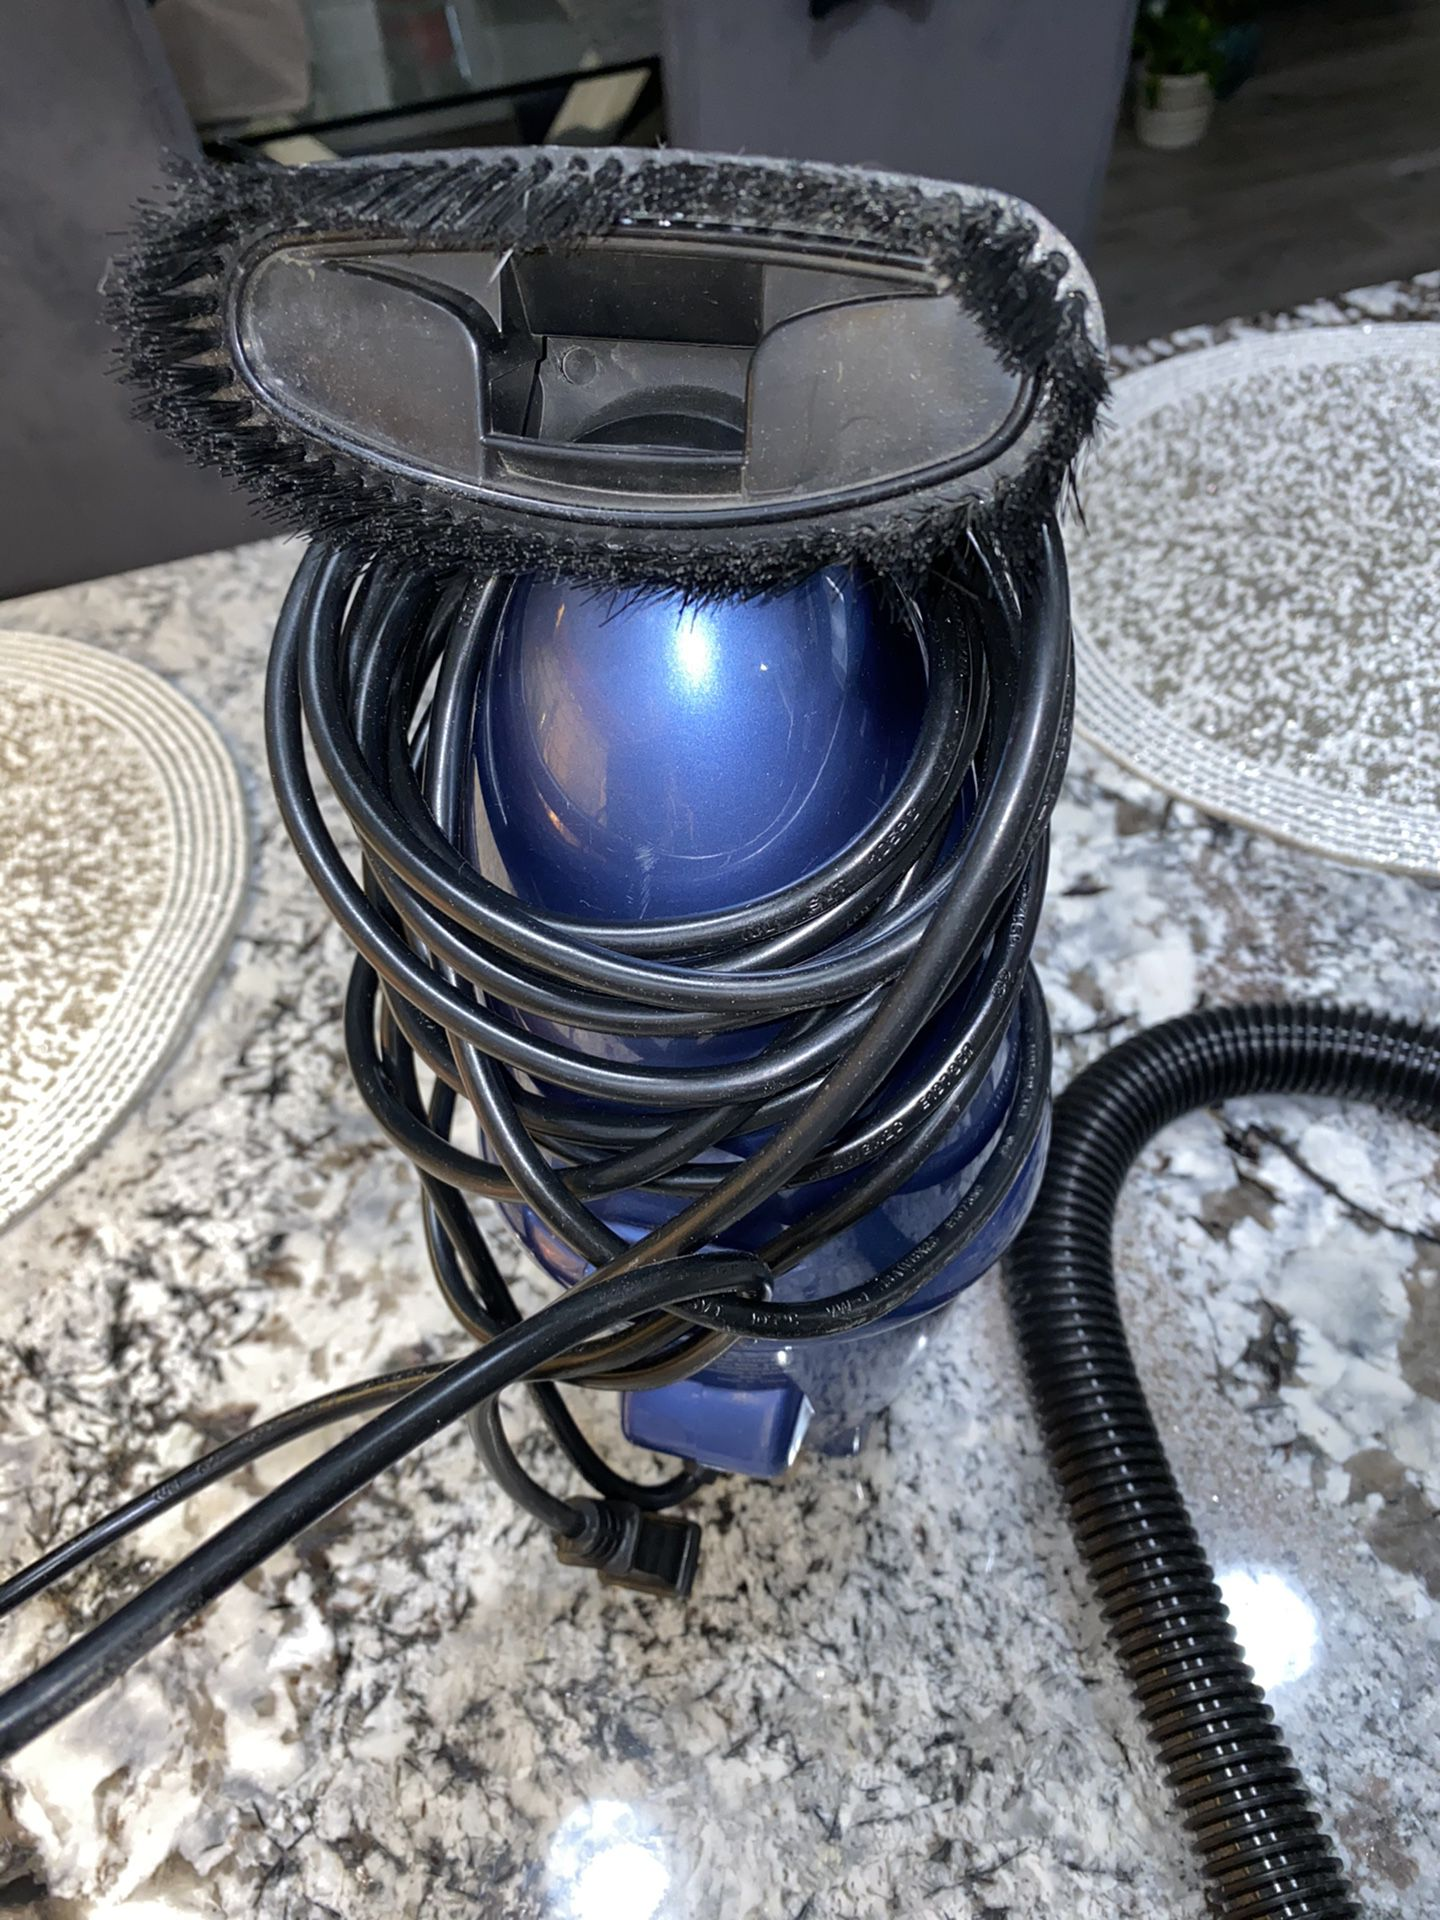 Handheld Auto/Household Vacuum